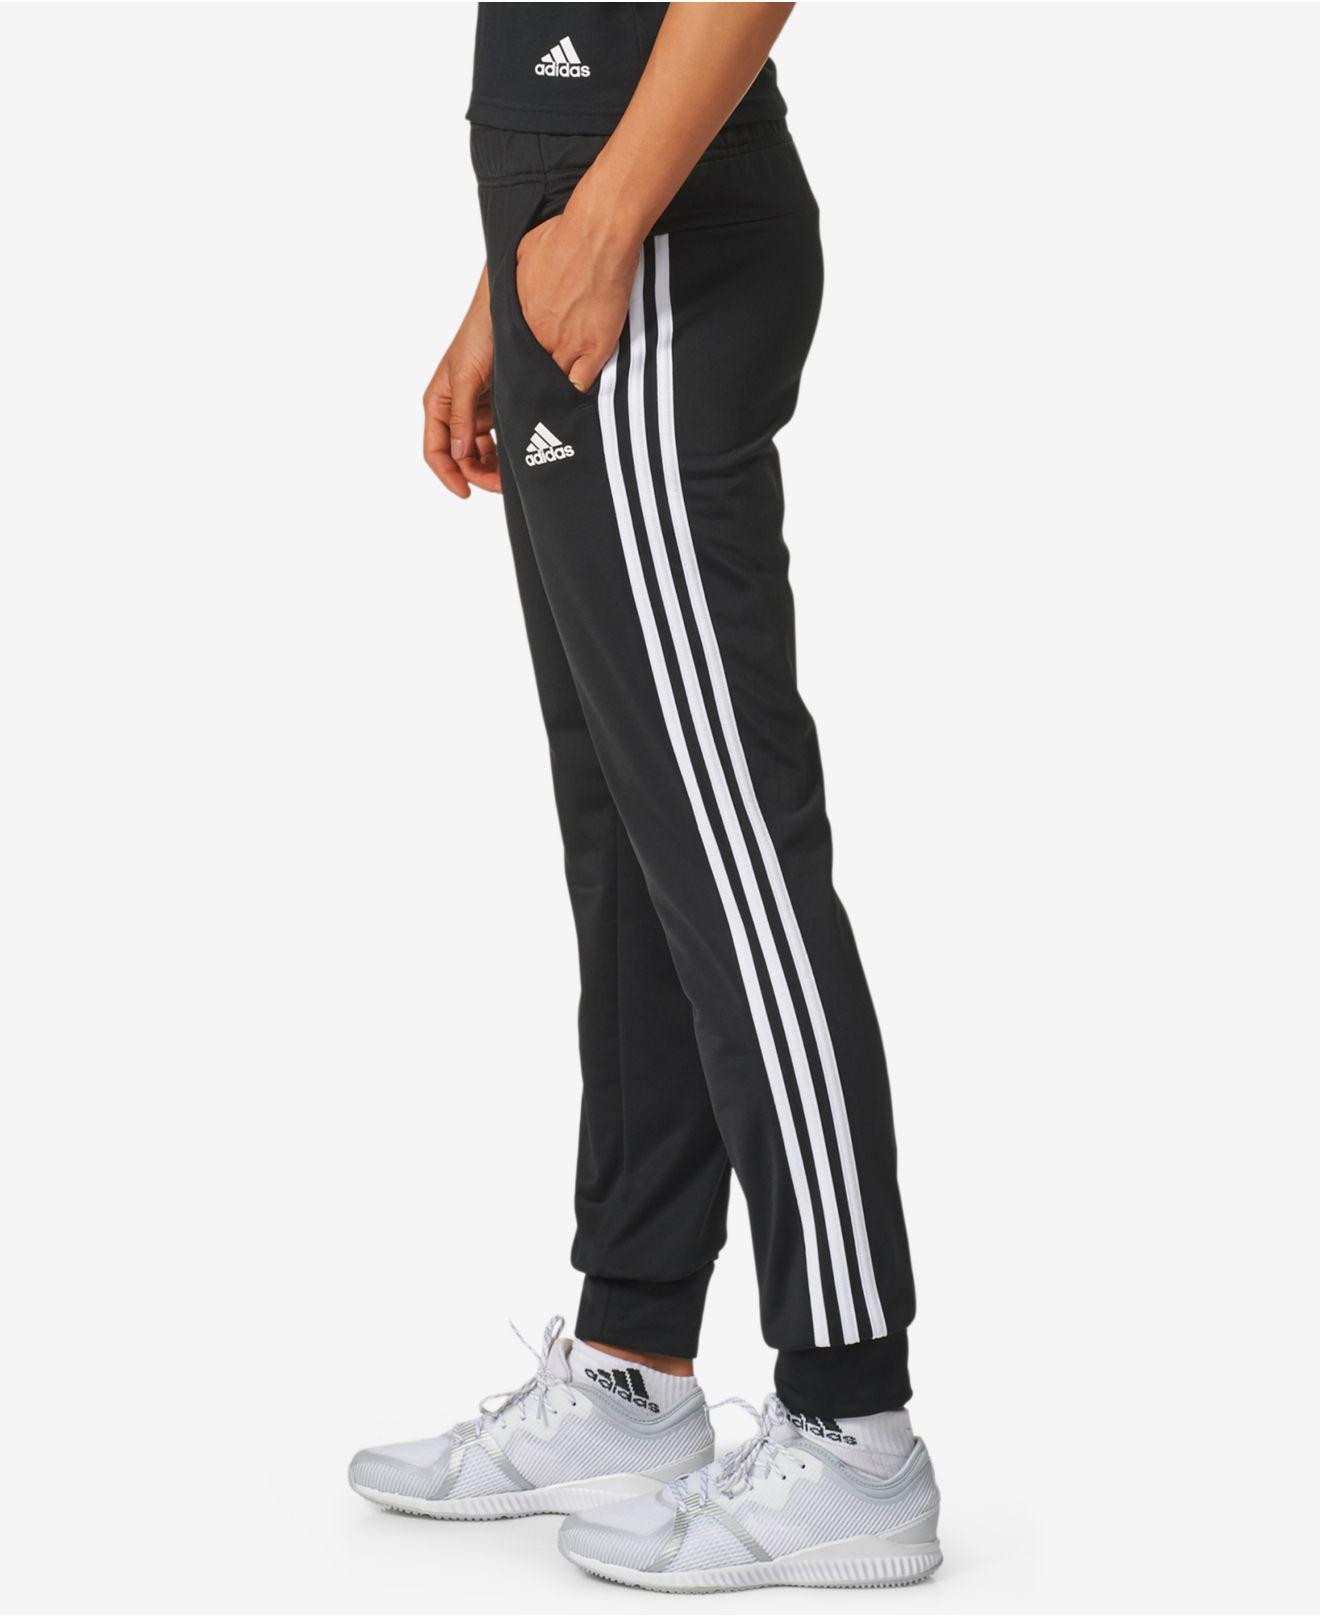 cher adidas purerenforcer rmr chaussures hommes blanc / noir / gris